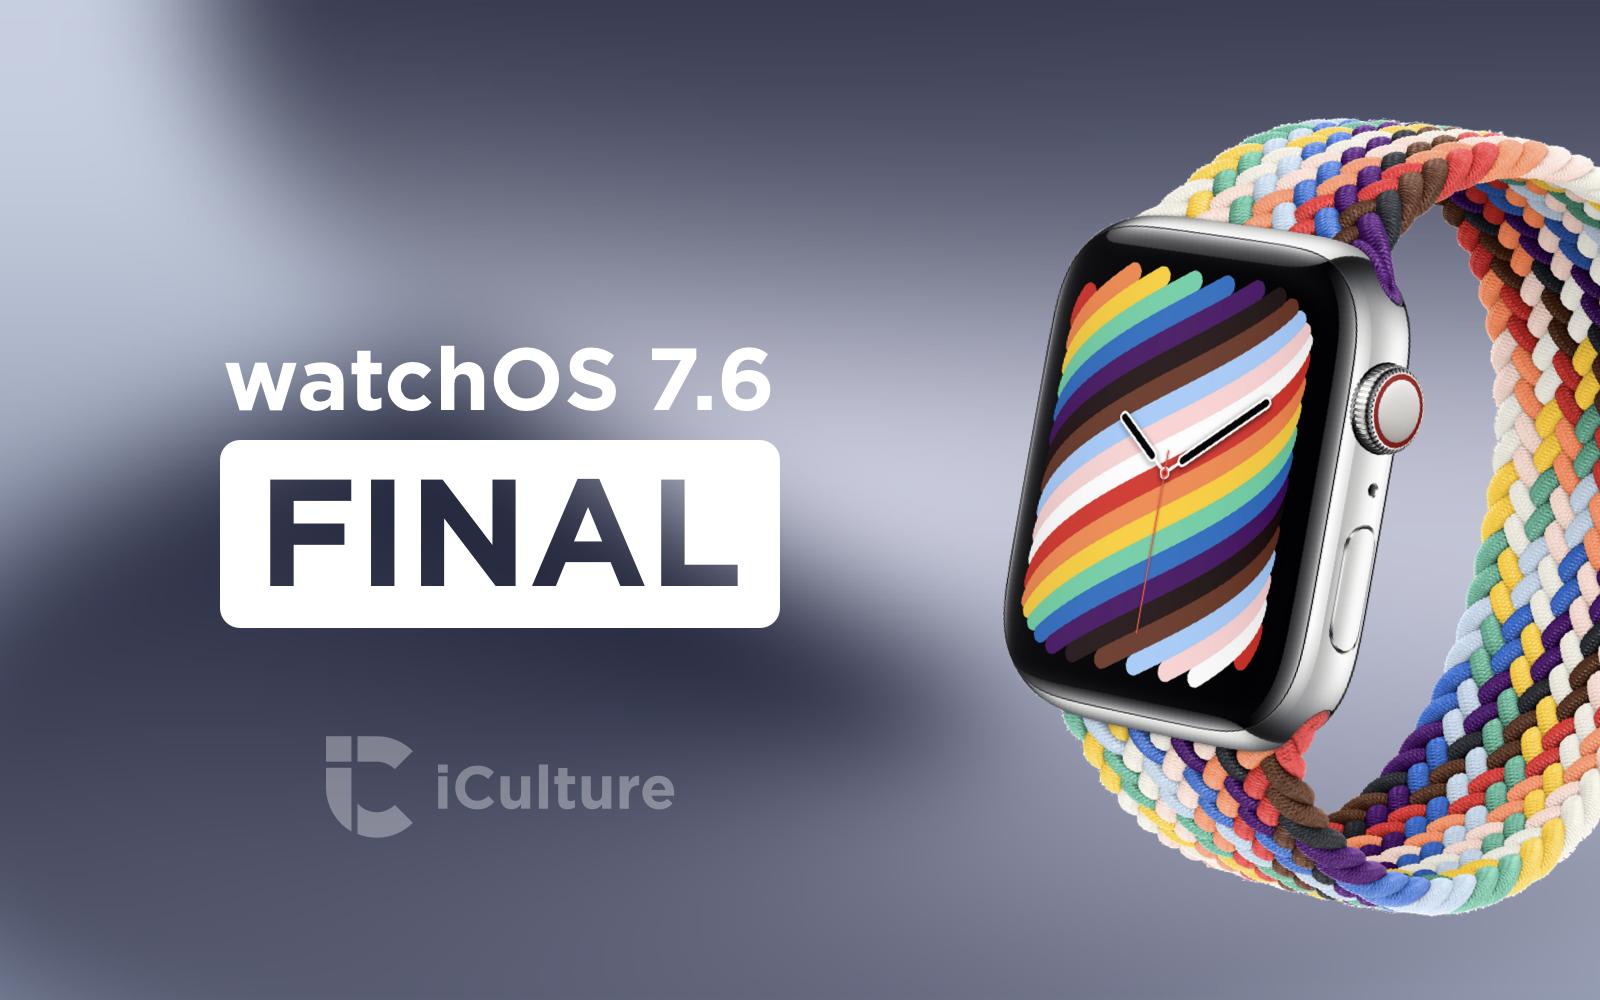 watchOS 7.6 Final.